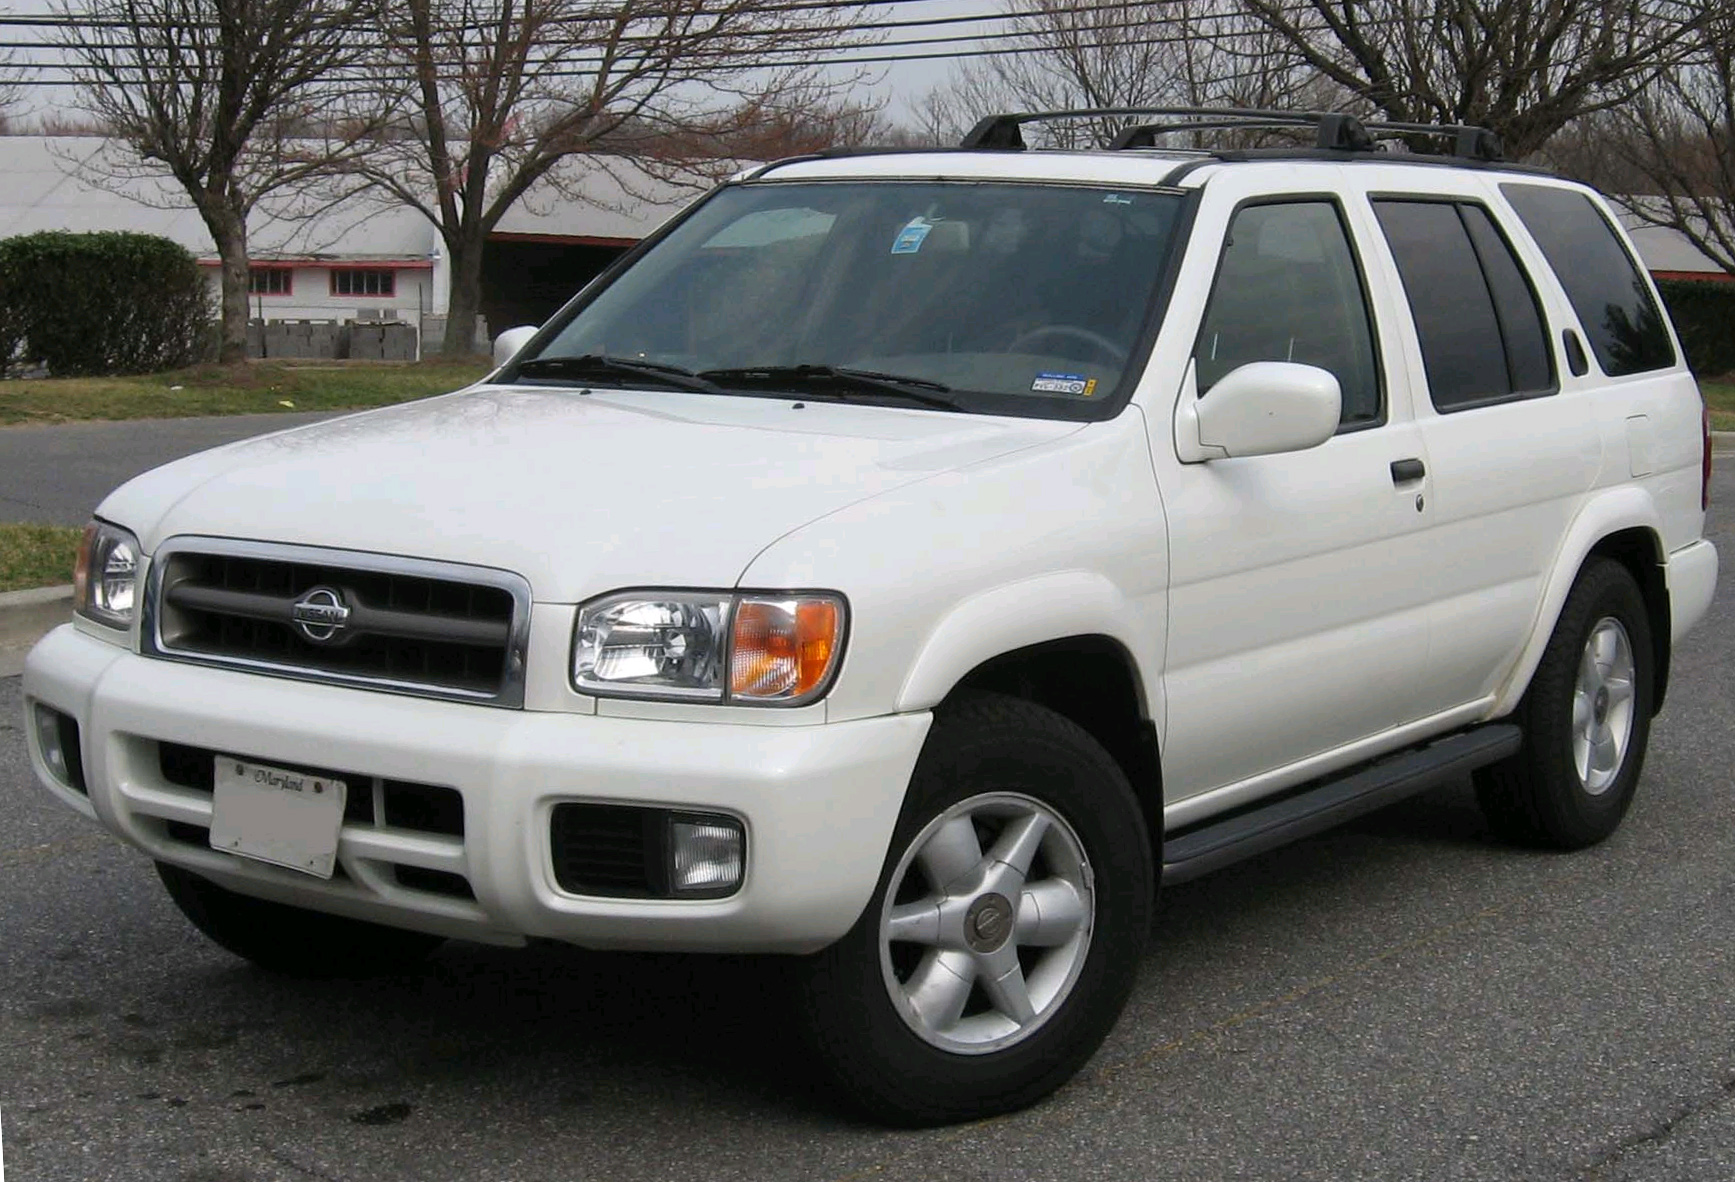 1996 Nissan Pathfinder Image 4